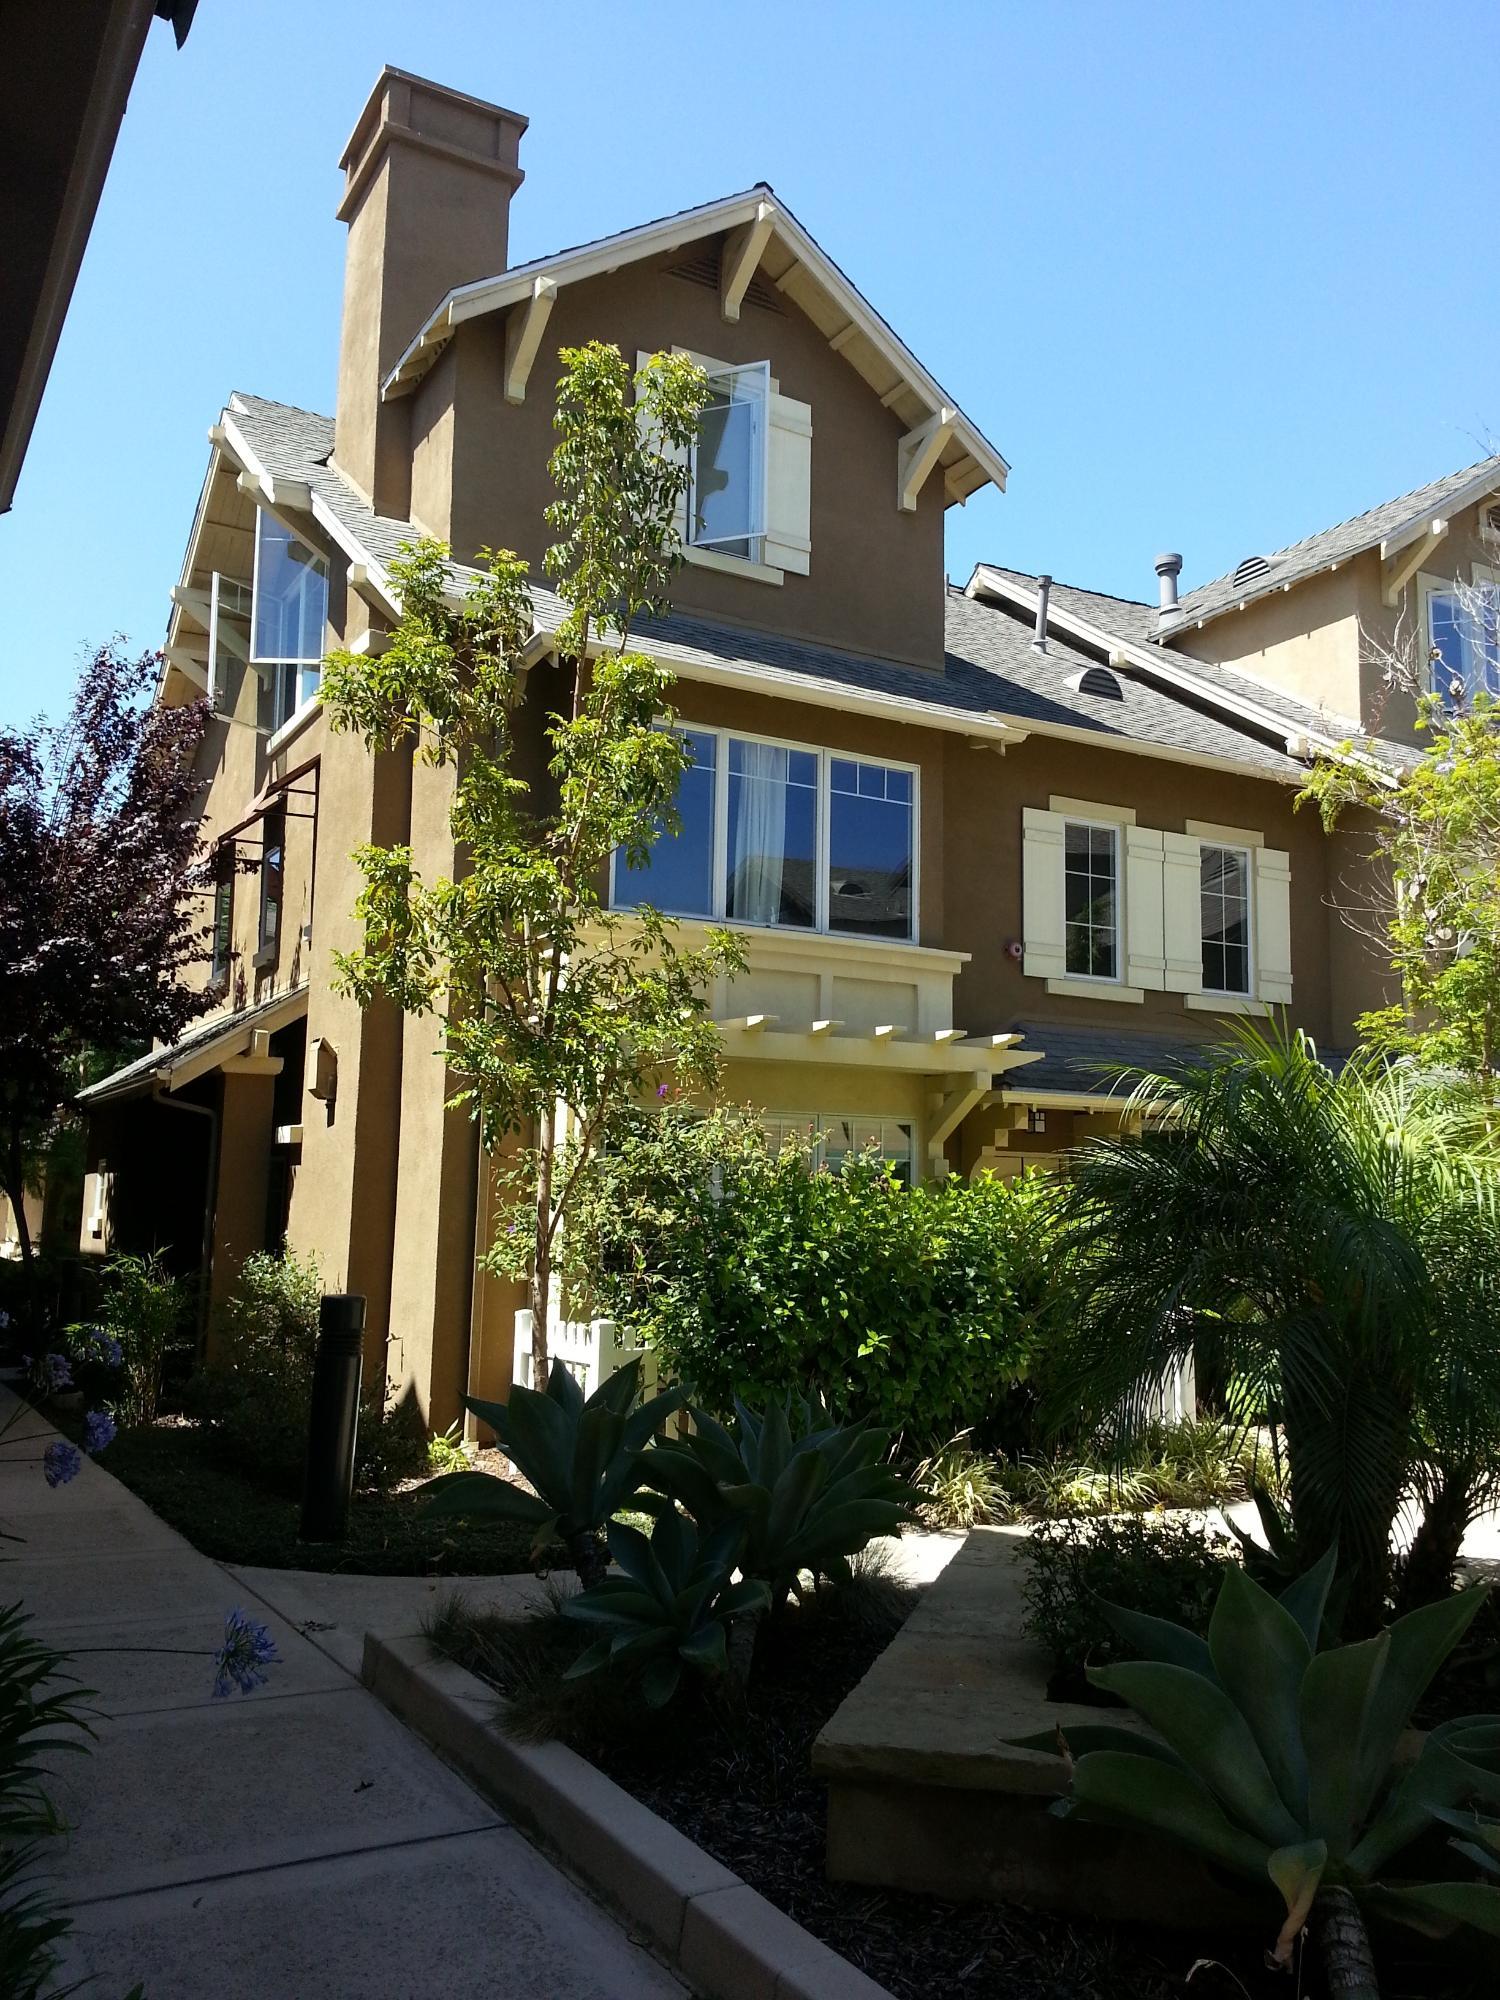 Property photo for 345 Kellogg Way #18 Goleta, California 93117 - 13-2145